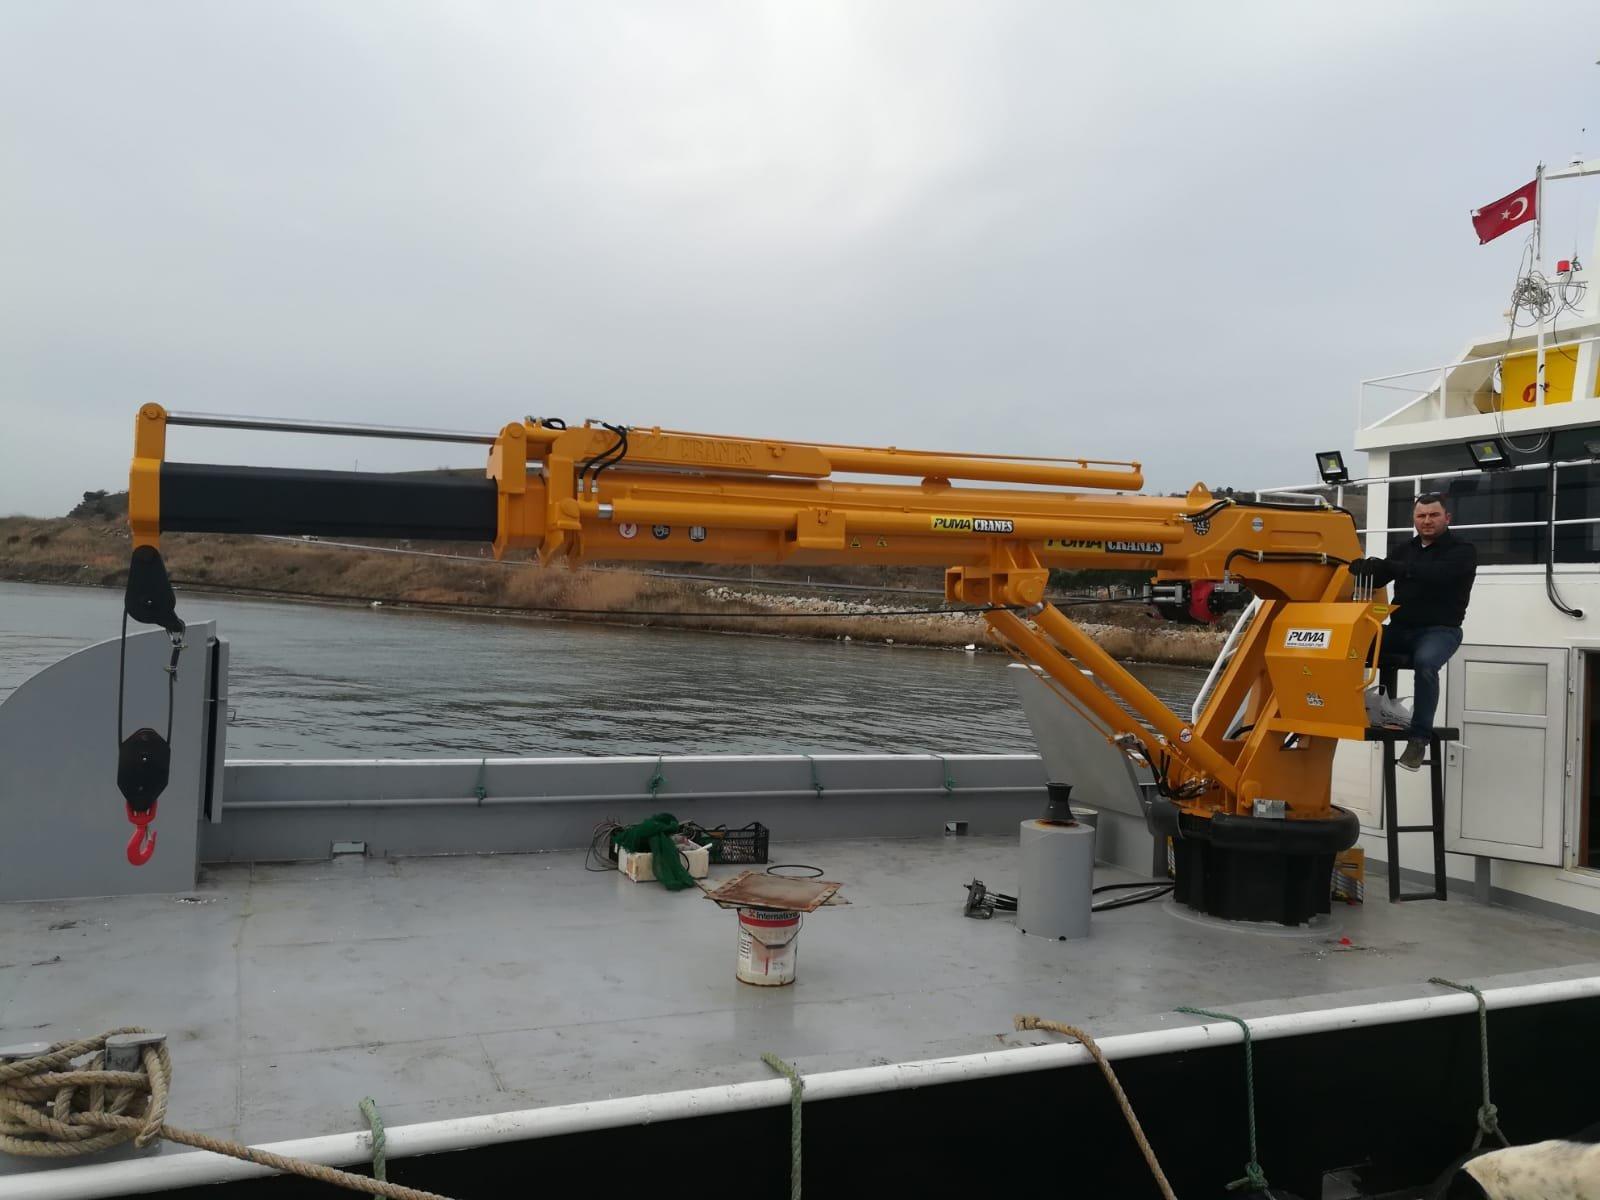 puma-marine-crane739930.jpg